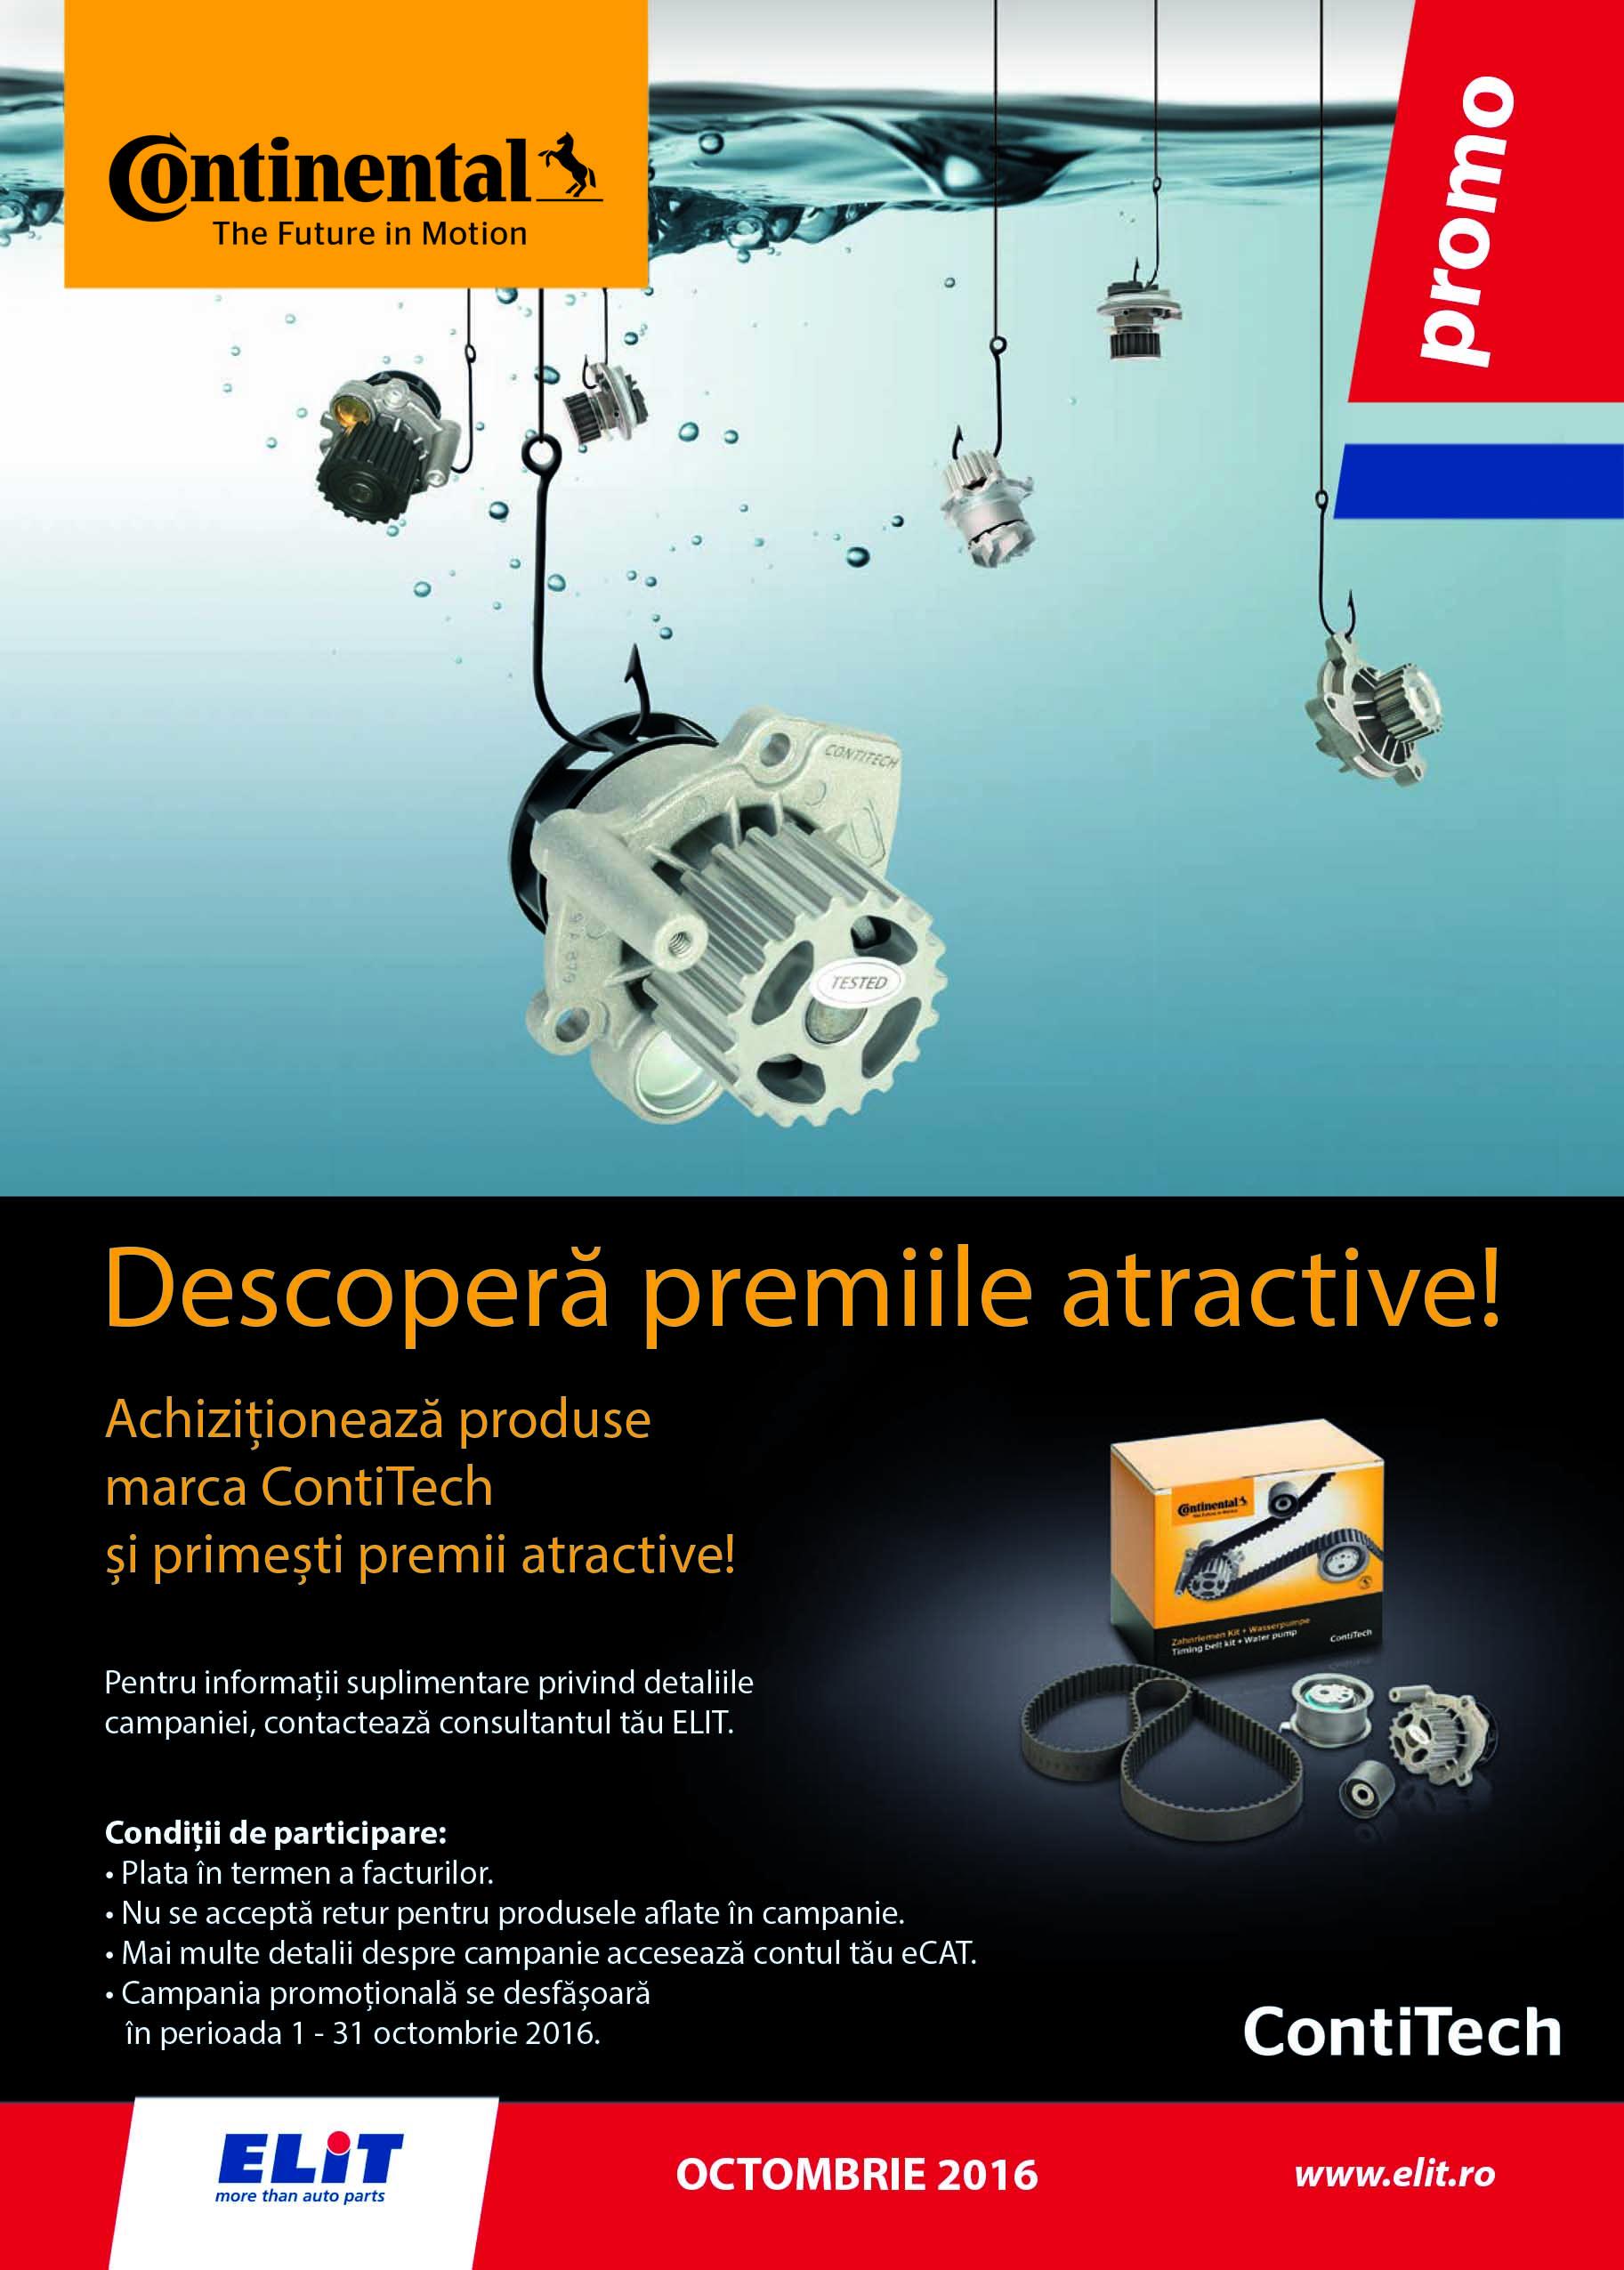 Promo Contitech